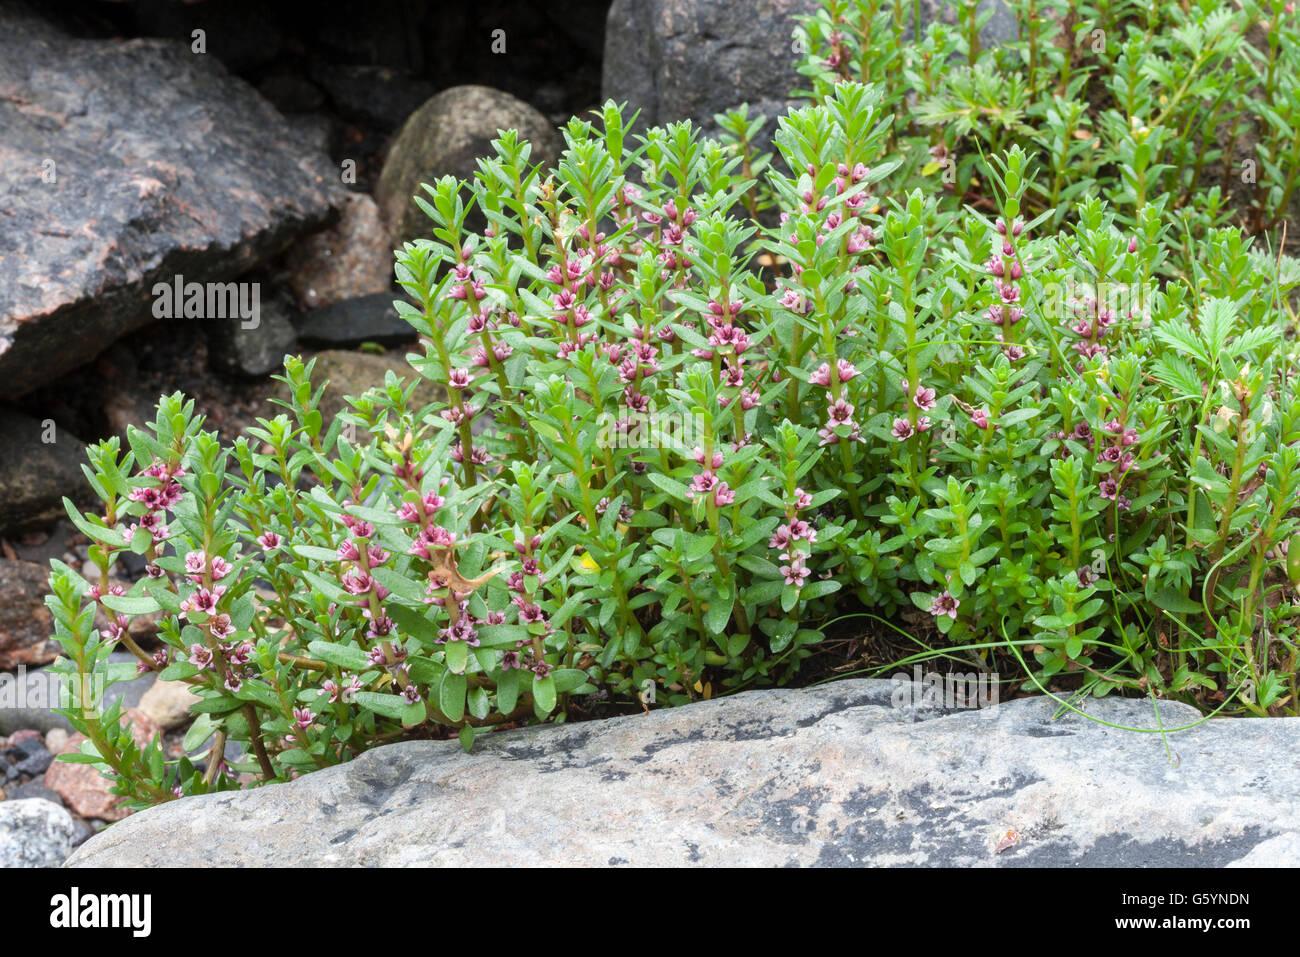 Sea milkwort (Lysimachia maritima) growth on rocky beach - Stock Image